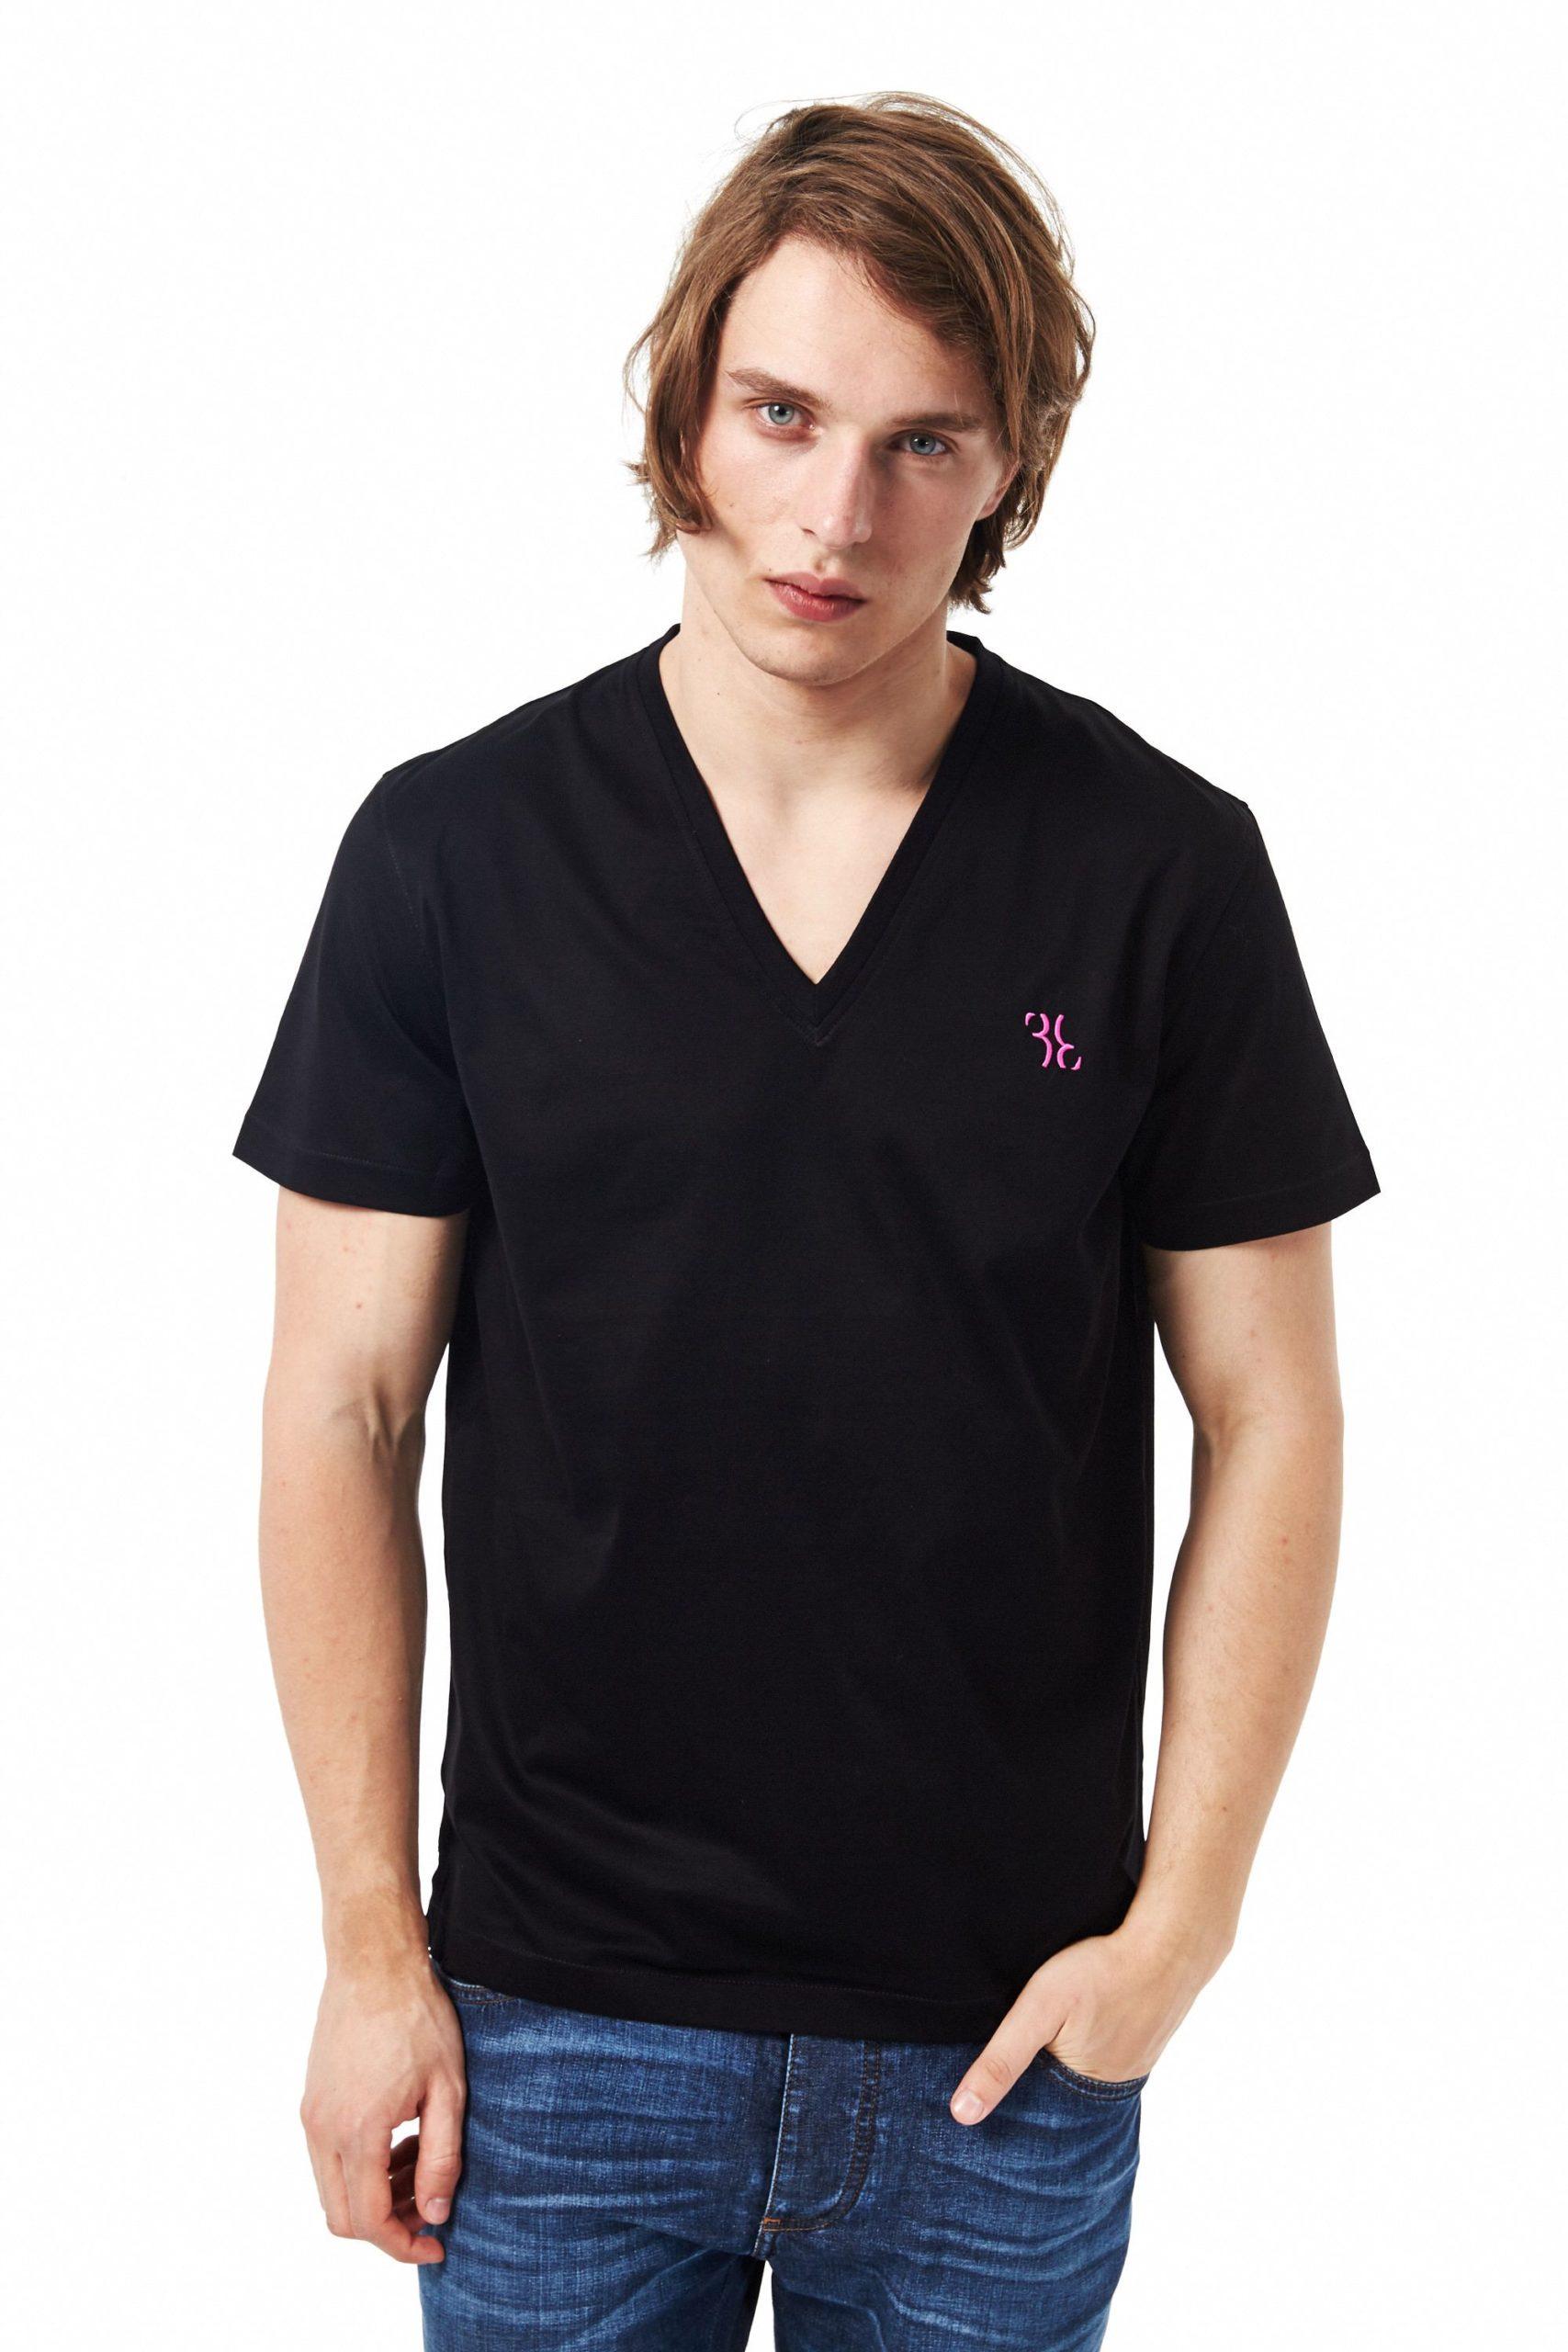 Billionaire Italian Couture Men's T-Shirt Black BI680795 - XS